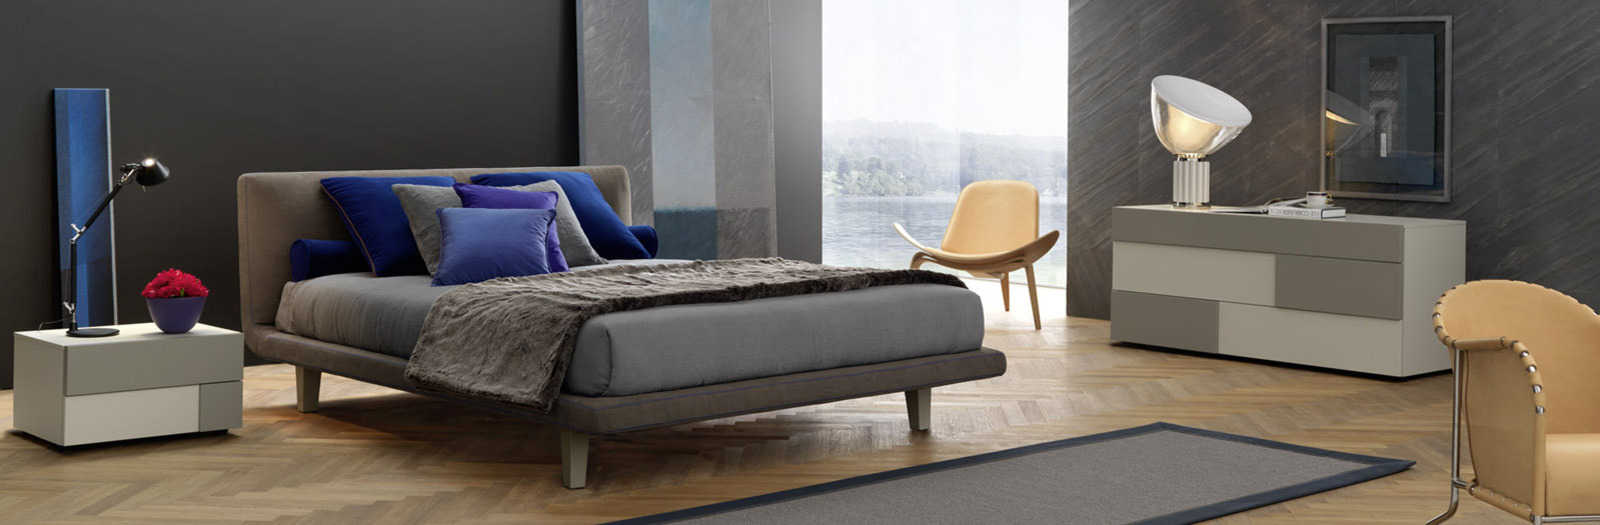 camere-stile-moderno-3